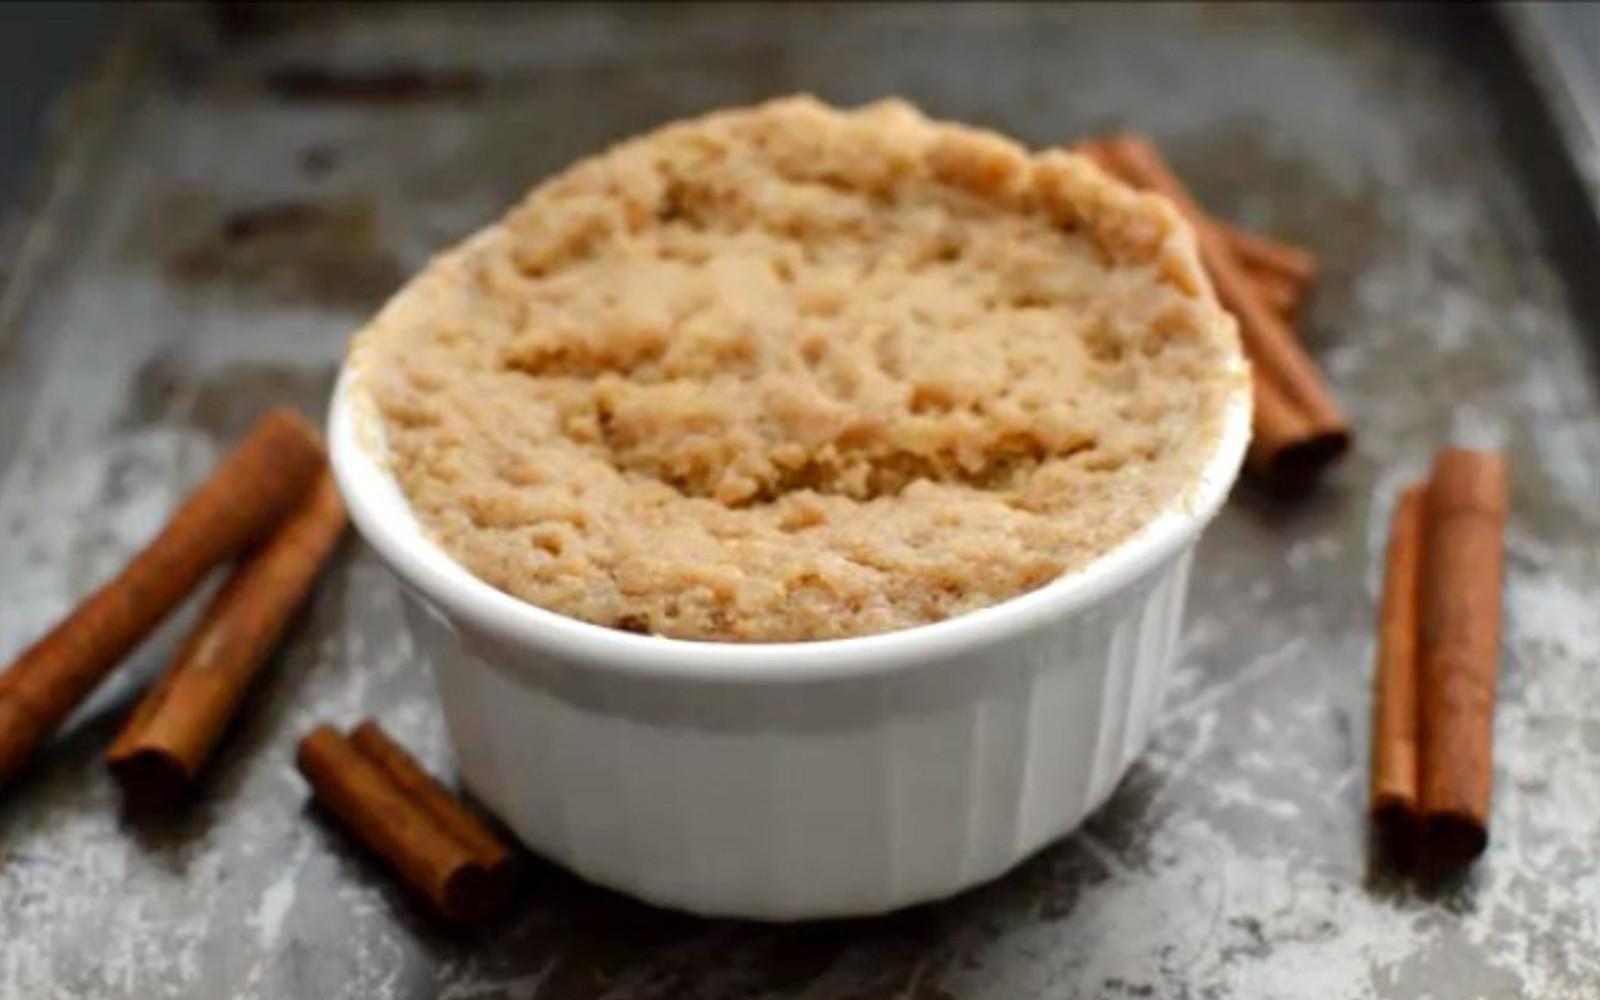 Vegan Gluten-Free Snickerdoodle Mug Cake with cinnamon sticks